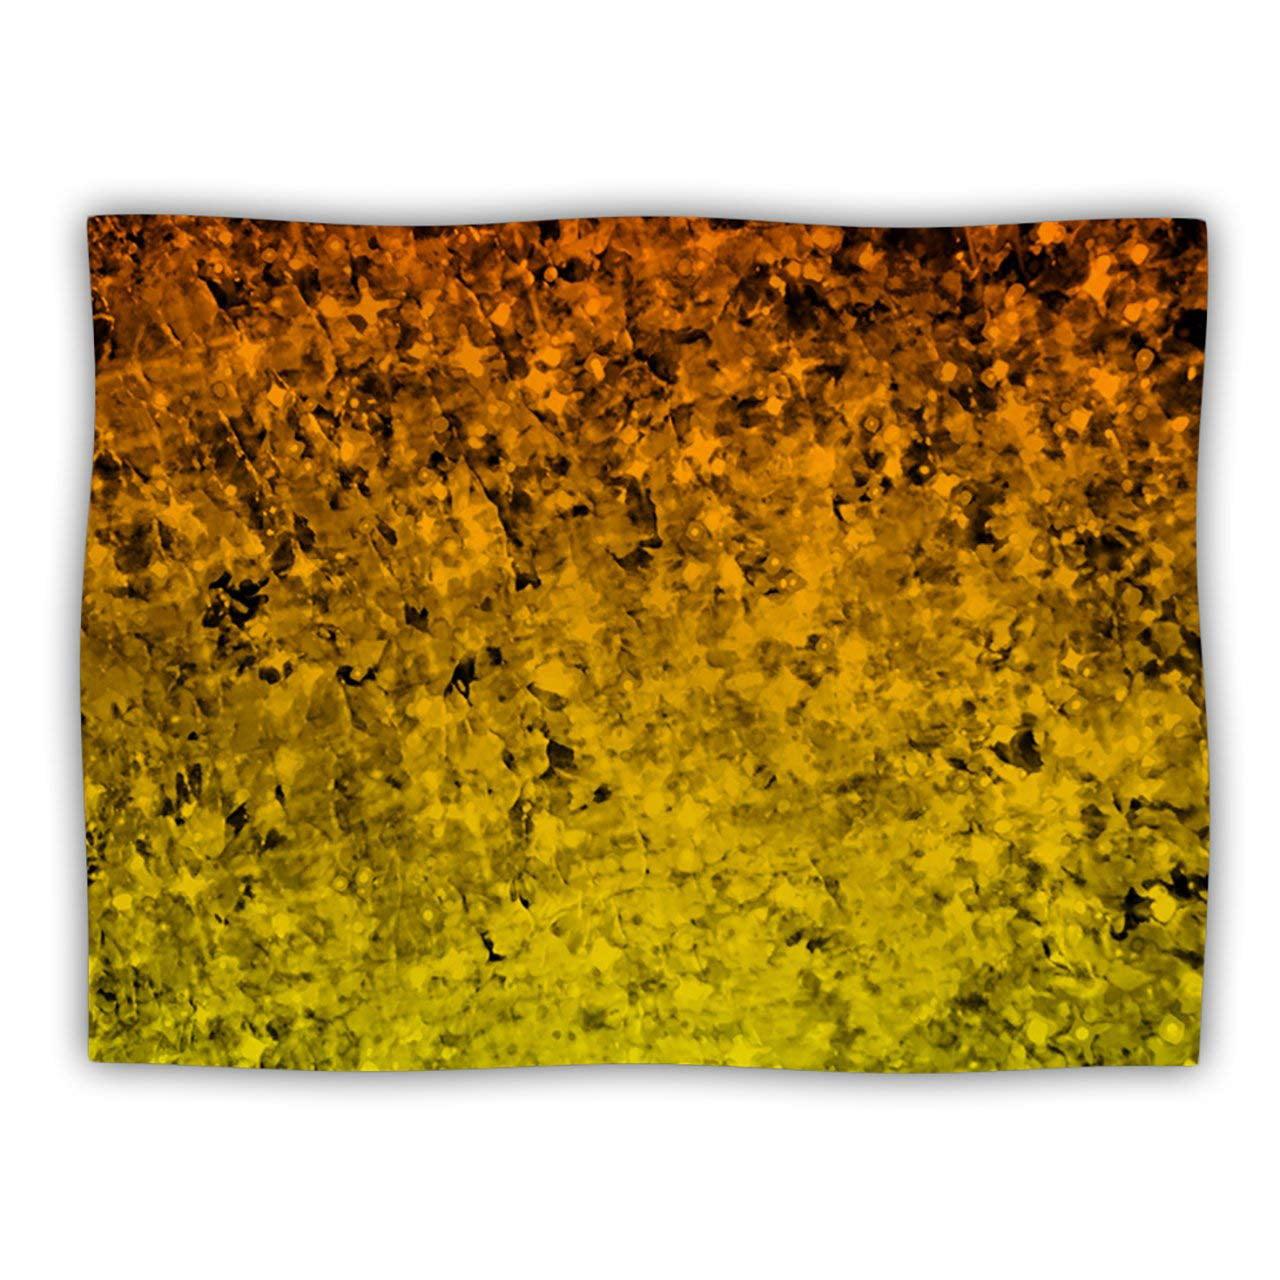 40 x 30 KESS InHouse CarolLynn Tice A Simple Abstract Yellow Gray Fleece Baby Blanket